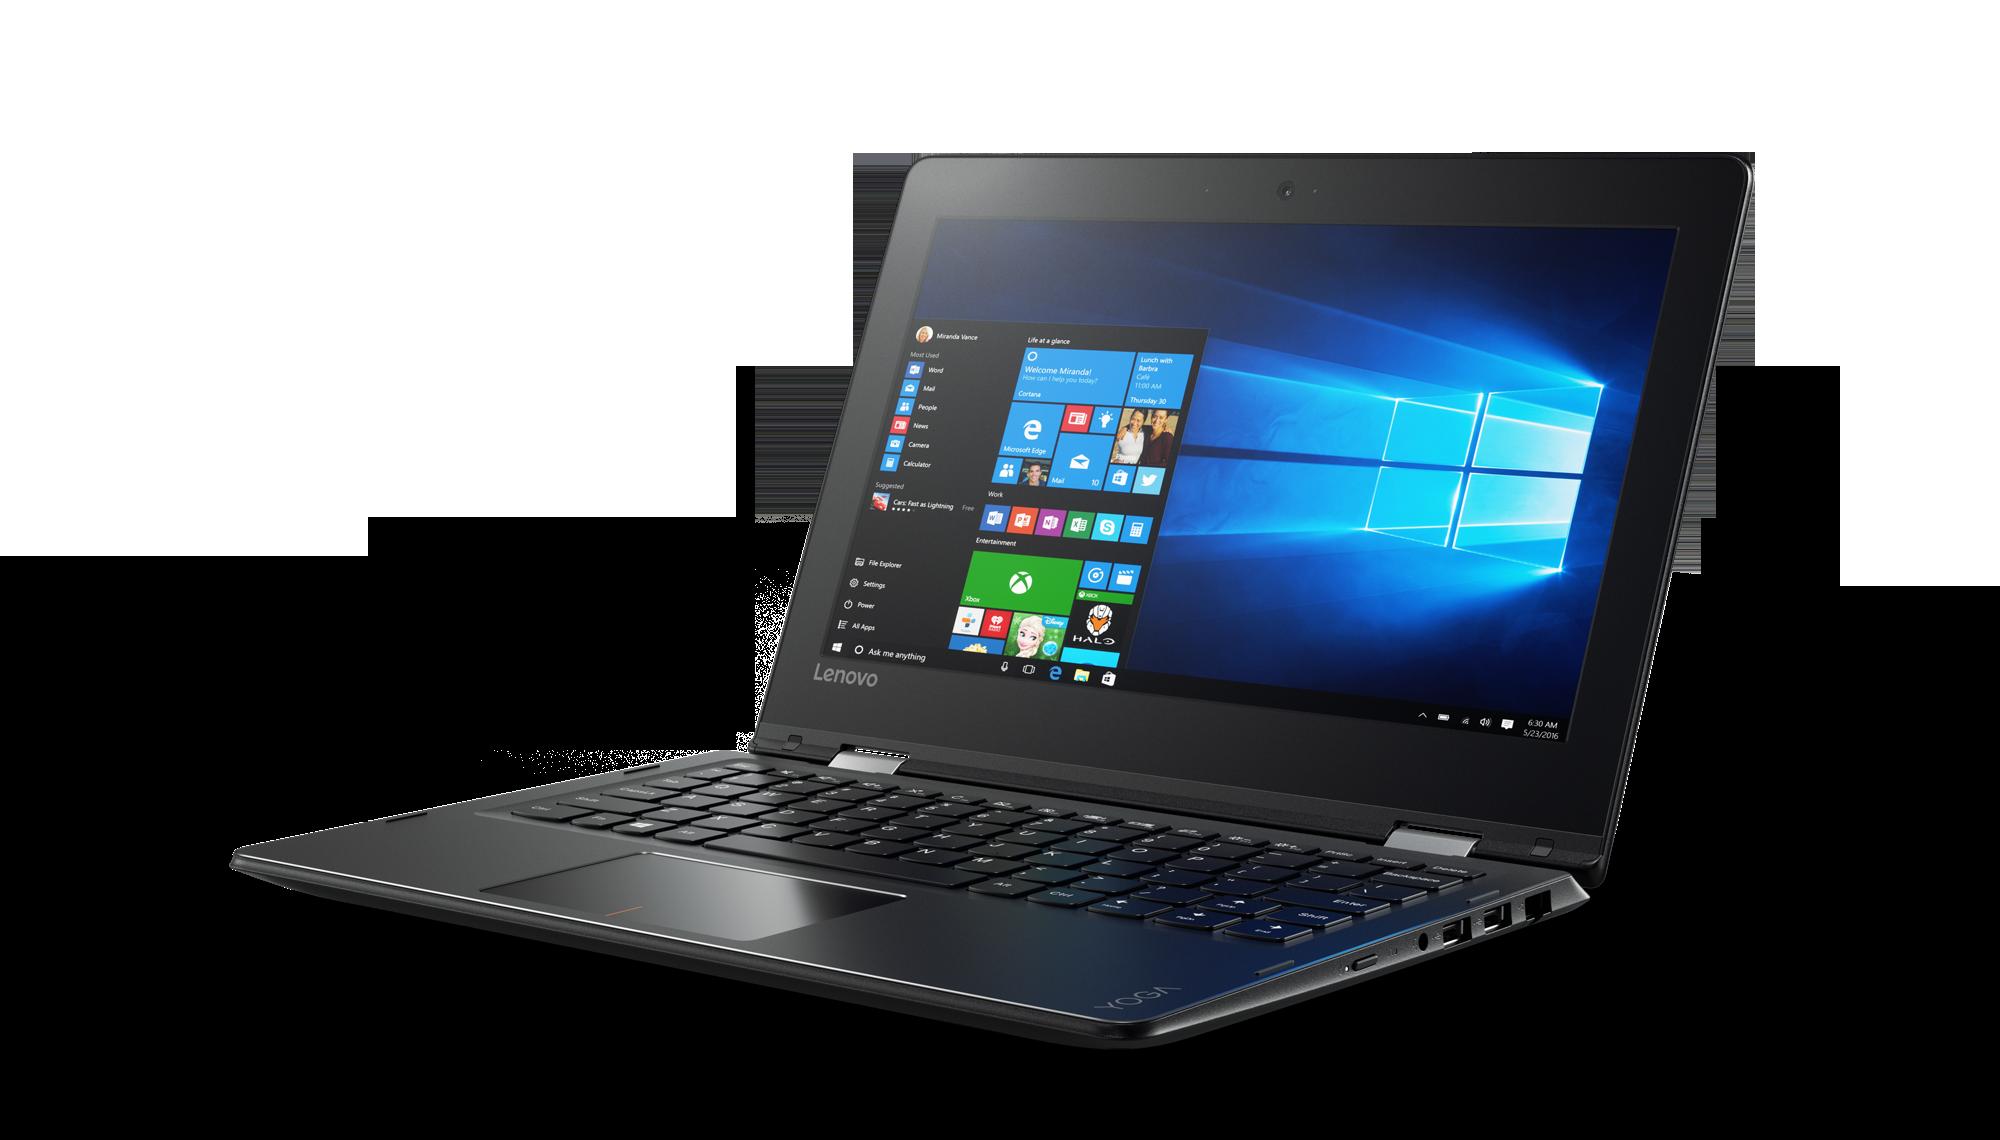 "Lenovo YOGA 310-11IAP Celeron-DC N3350 2,40GHz/4GB/32GB/11,6"" HD/IPS/AG/multitouch/WIN10 černá 80U20066CK"